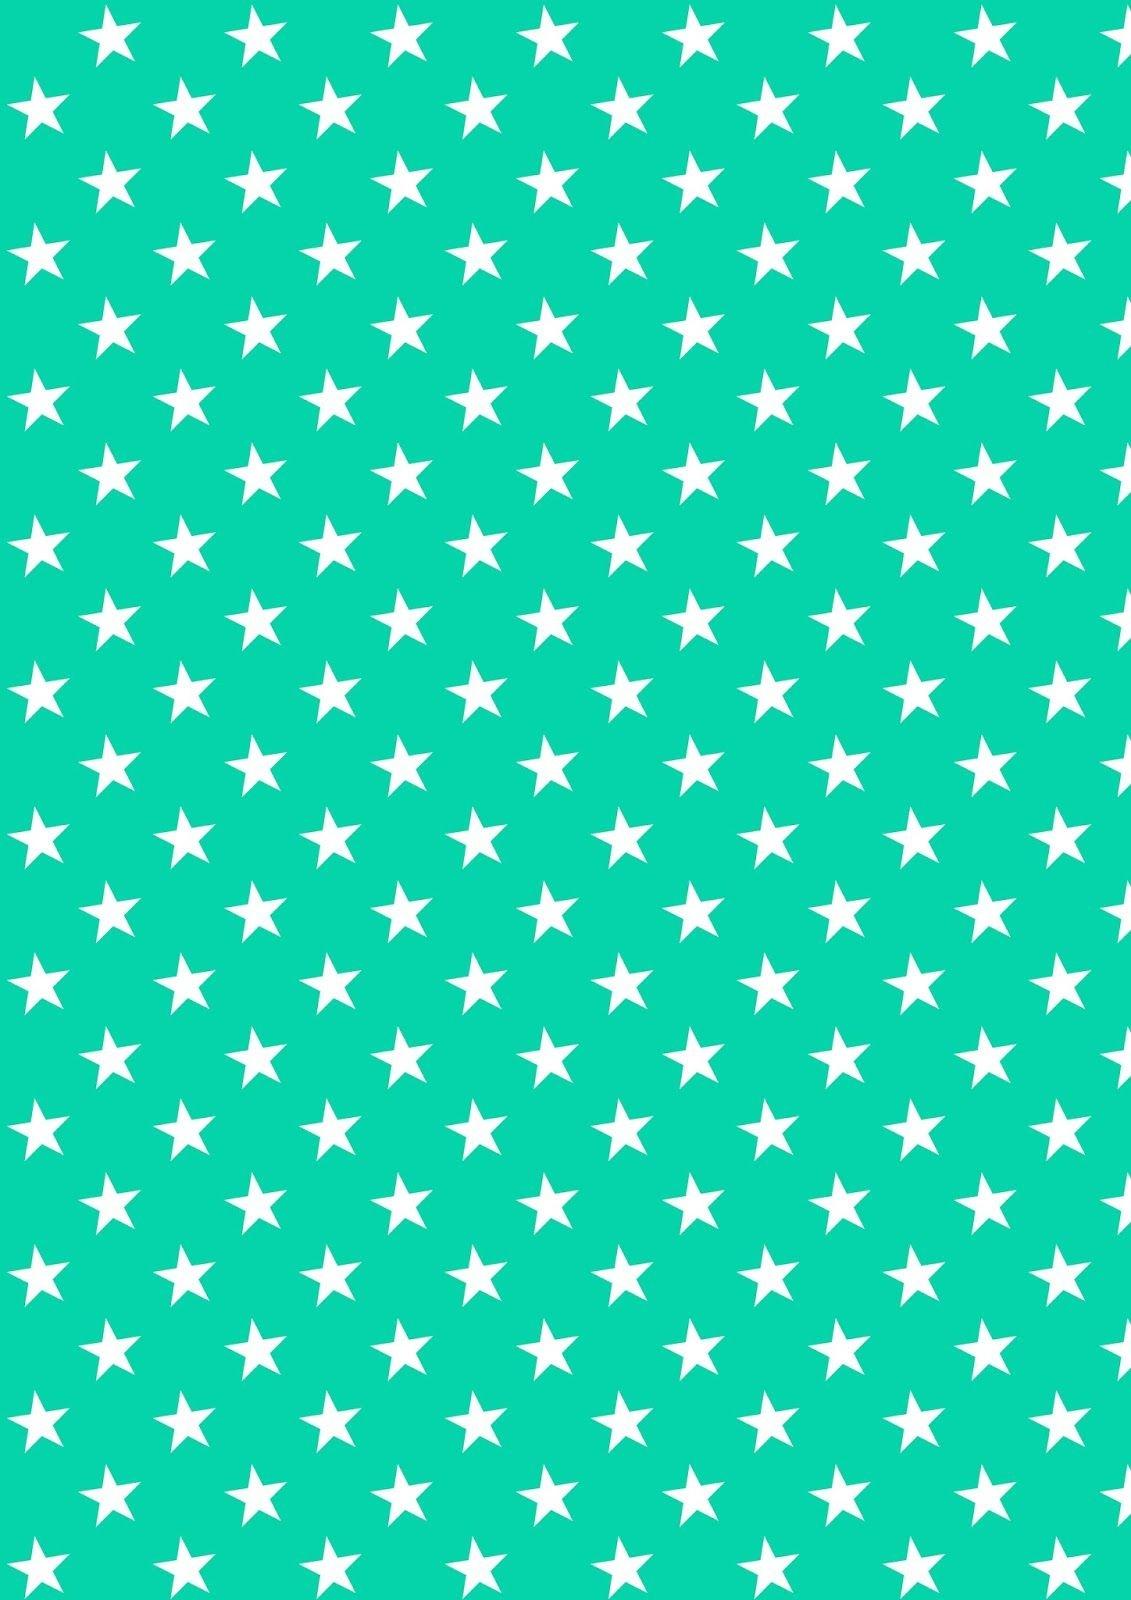 Free Digital Star Scrapbooking Paper - Ausdruckbares Geschenkpapier - Free Online Digital Scrapbooking Printable